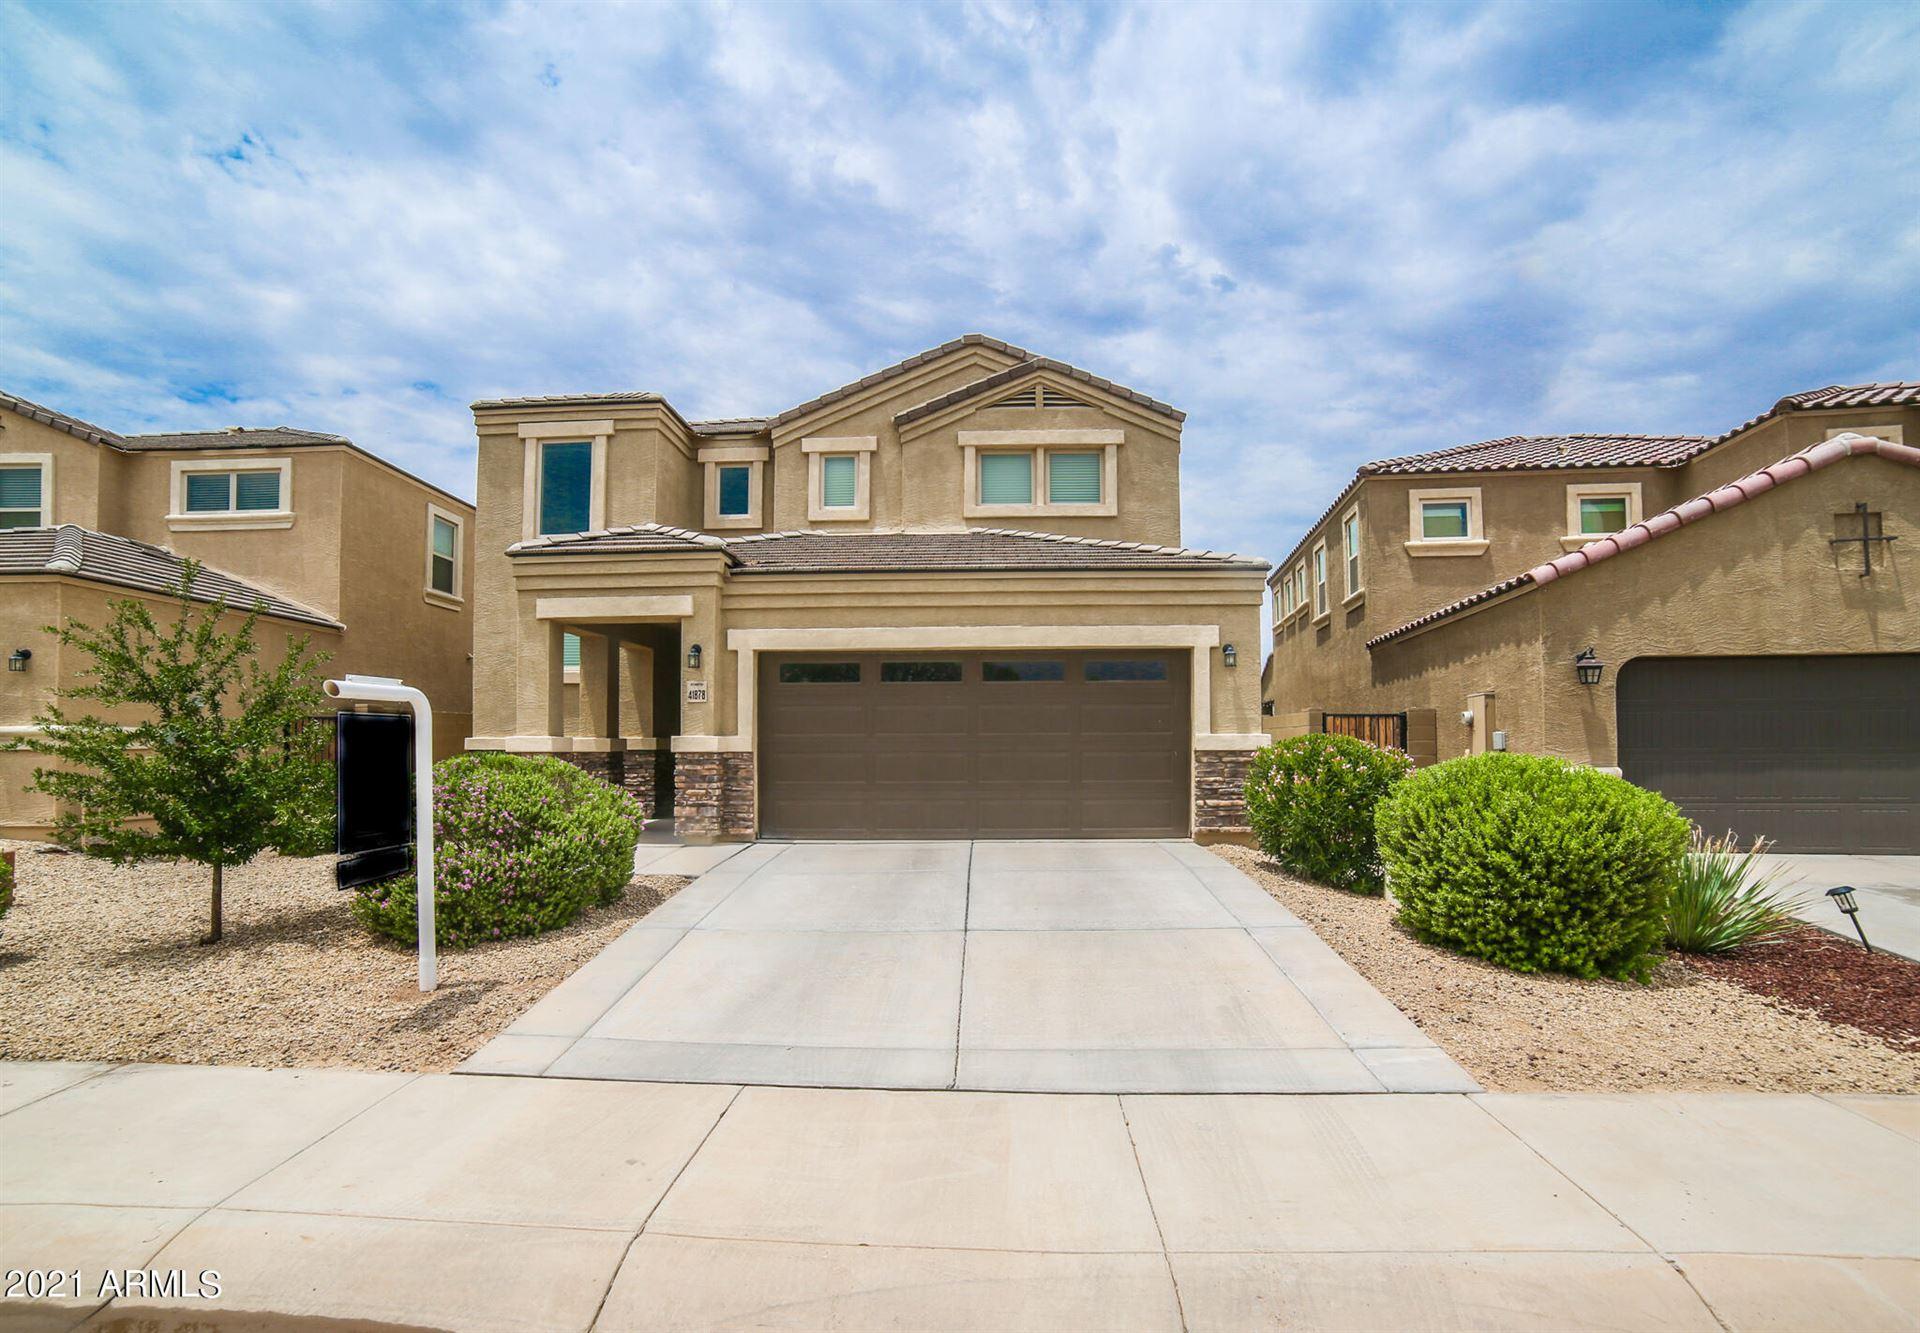 Photo for 41878 W ALLEGRA Drive, Maricopa, AZ 85138 (MLS # 6266696)